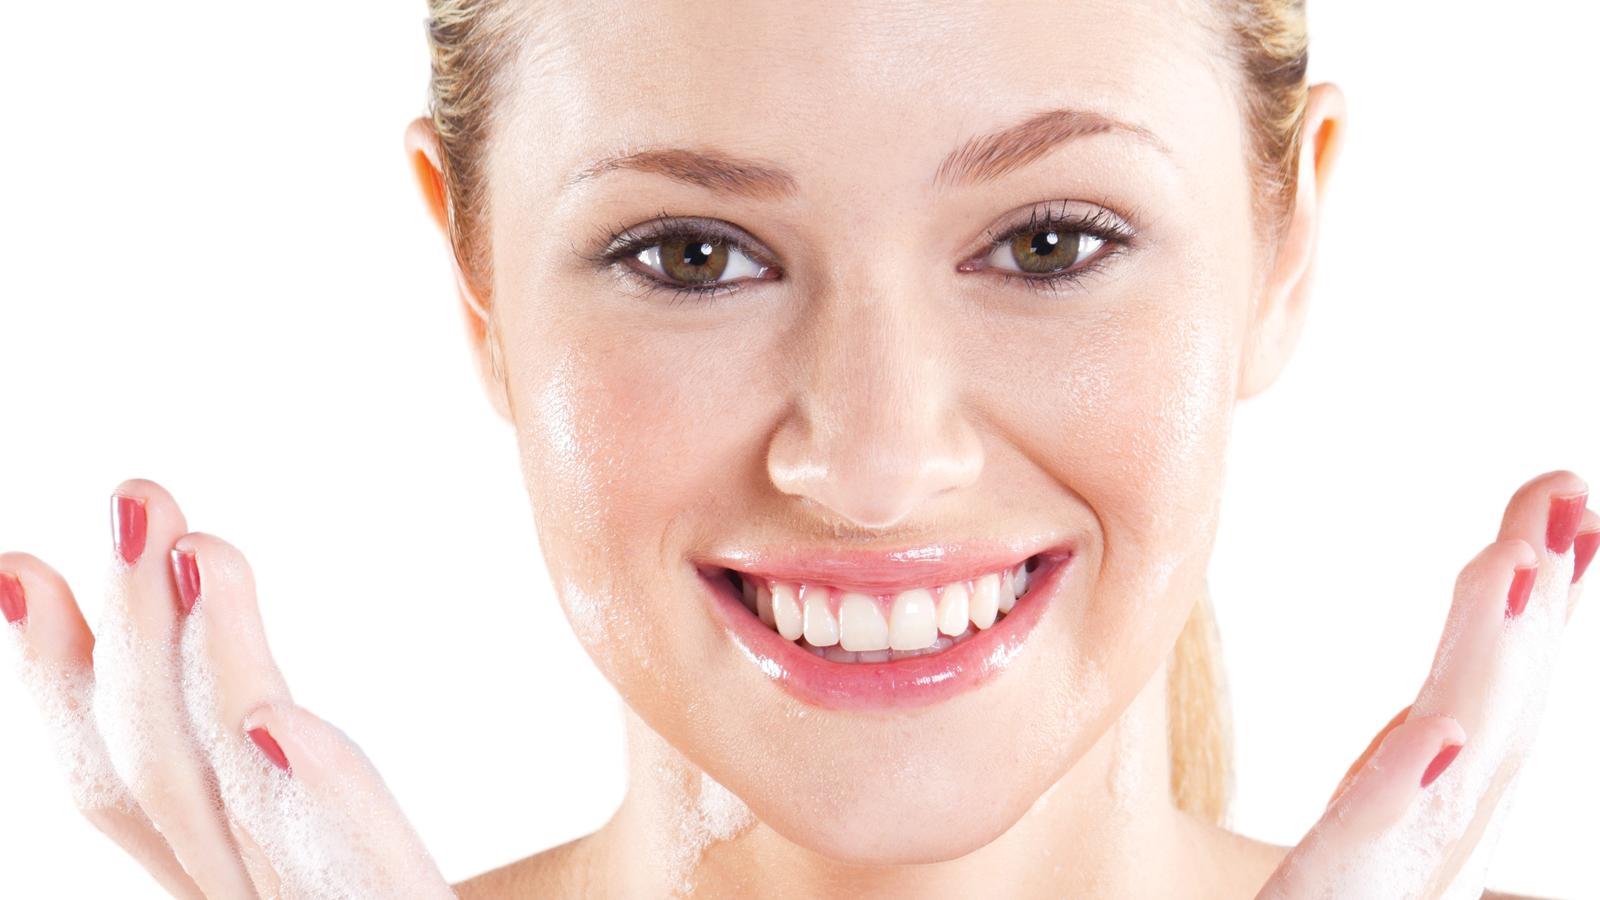 Olive-oil-to-moisturize-skin